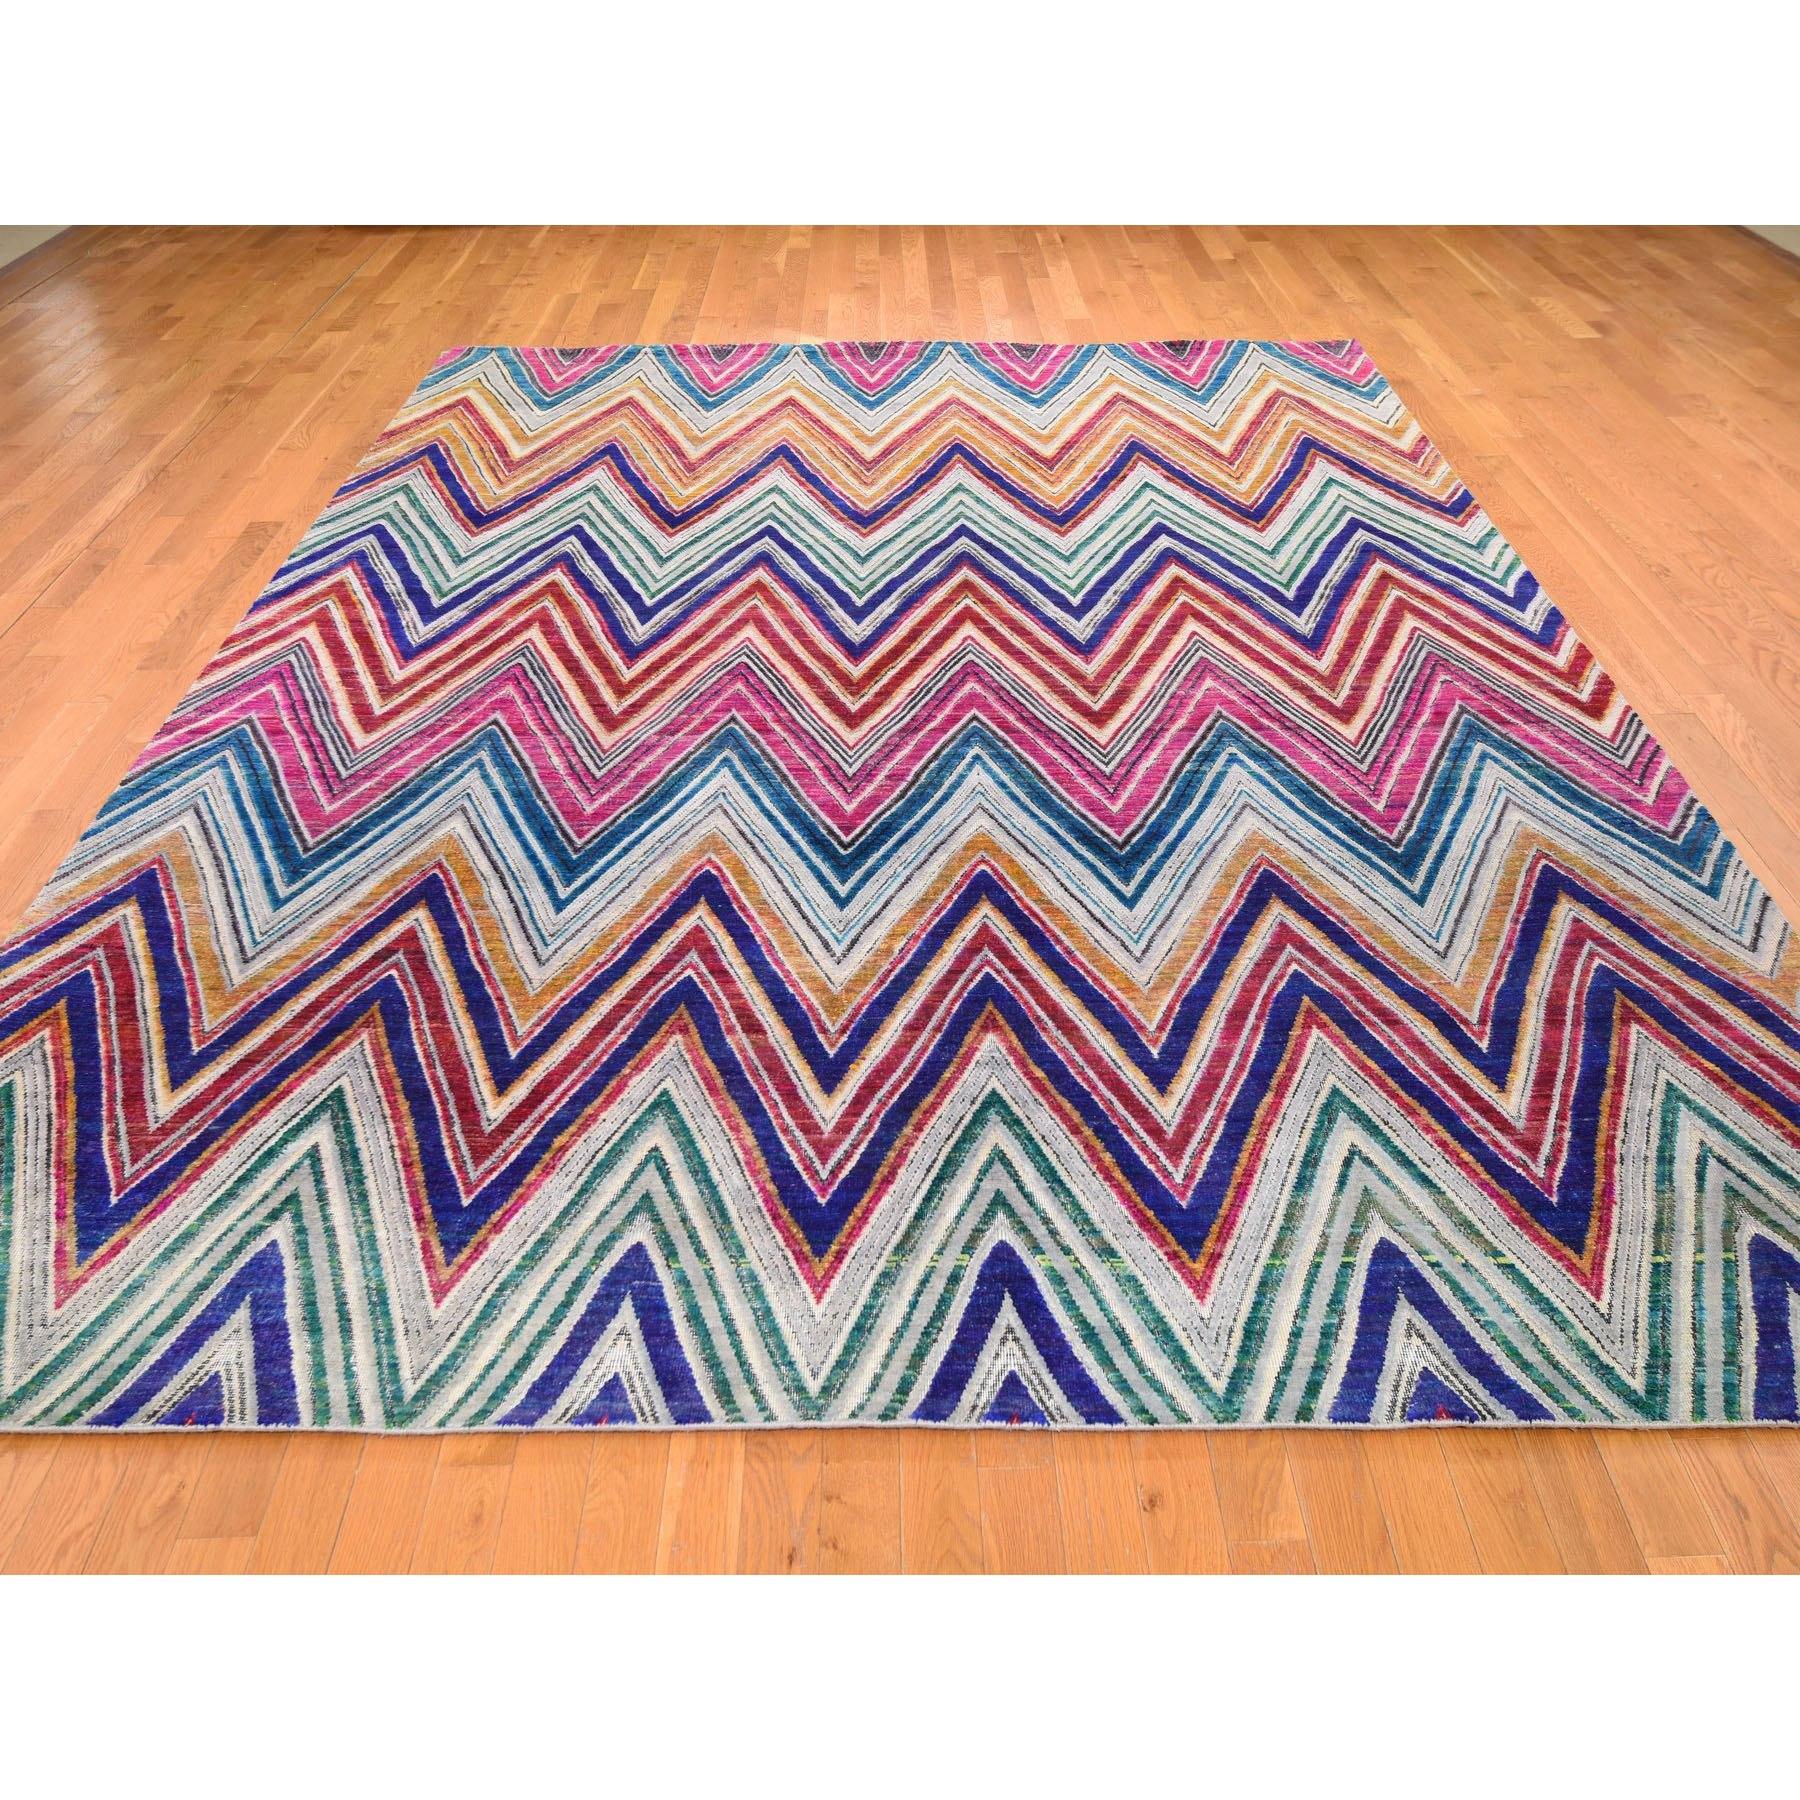 9-x12- Hand Knotted Chevron Design Sari Silk with Textured Wool Oriental Rug